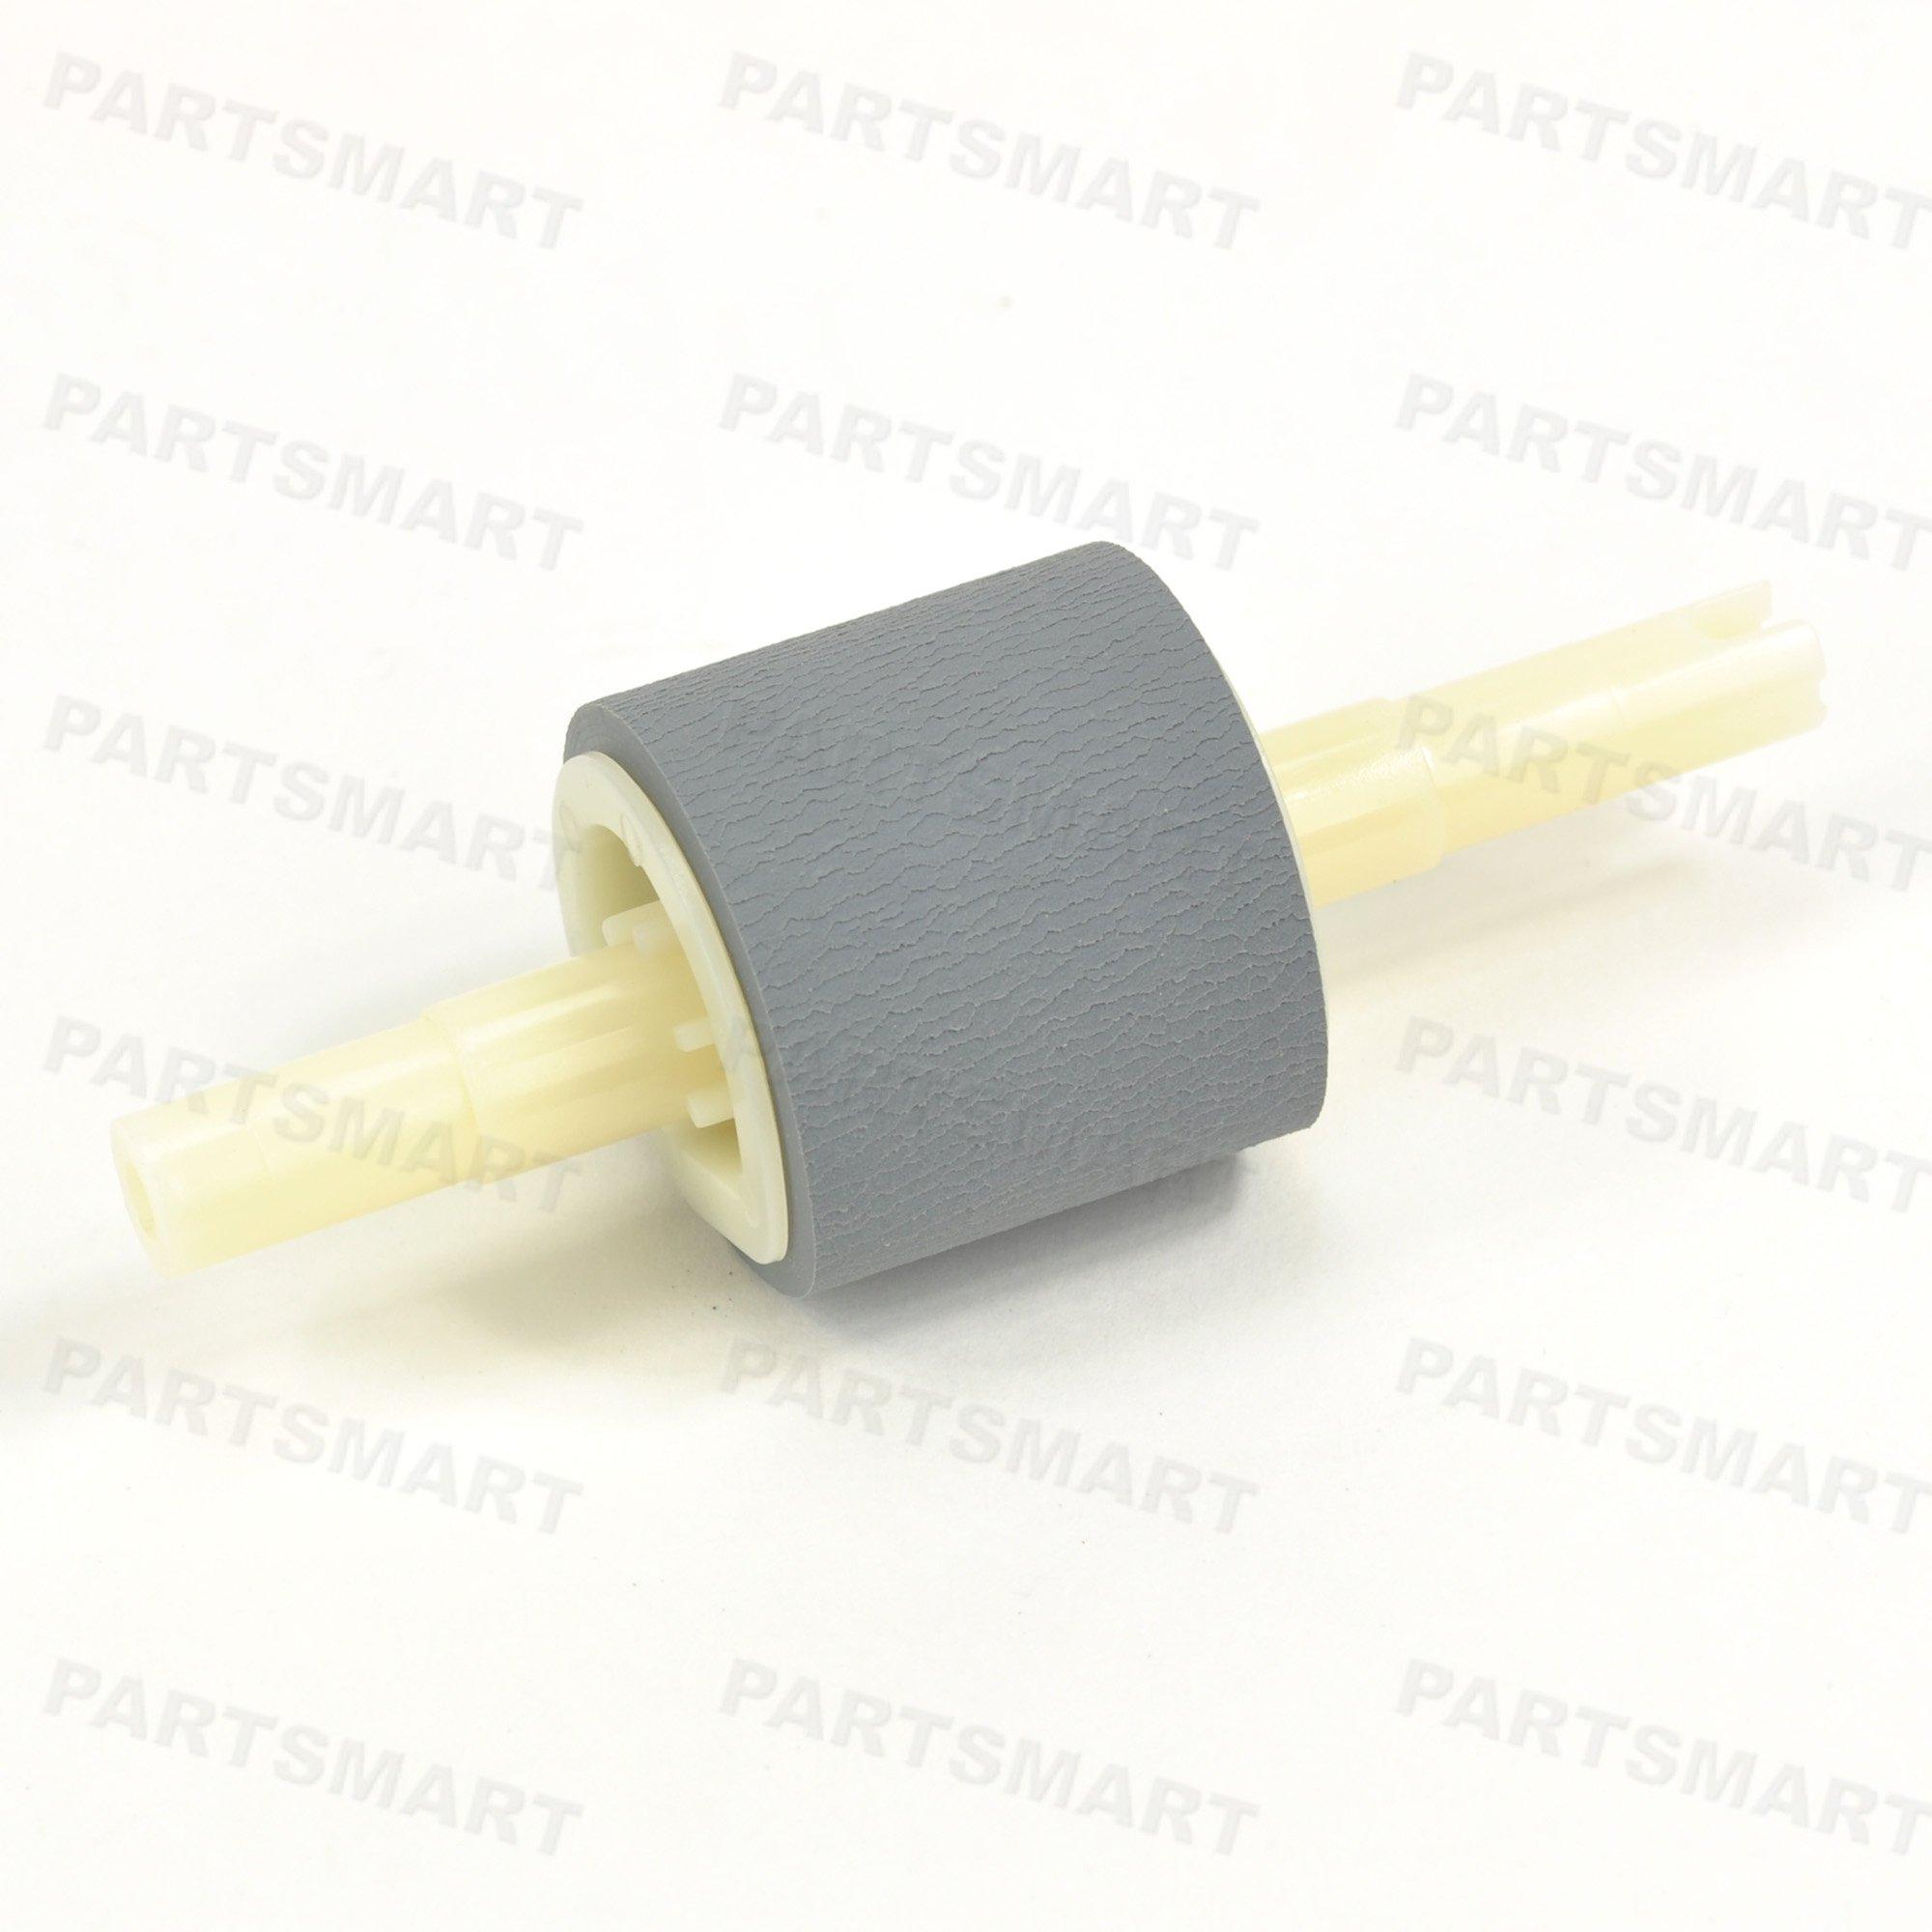 RL1-0540-000 Pickup Roller, Tray 2